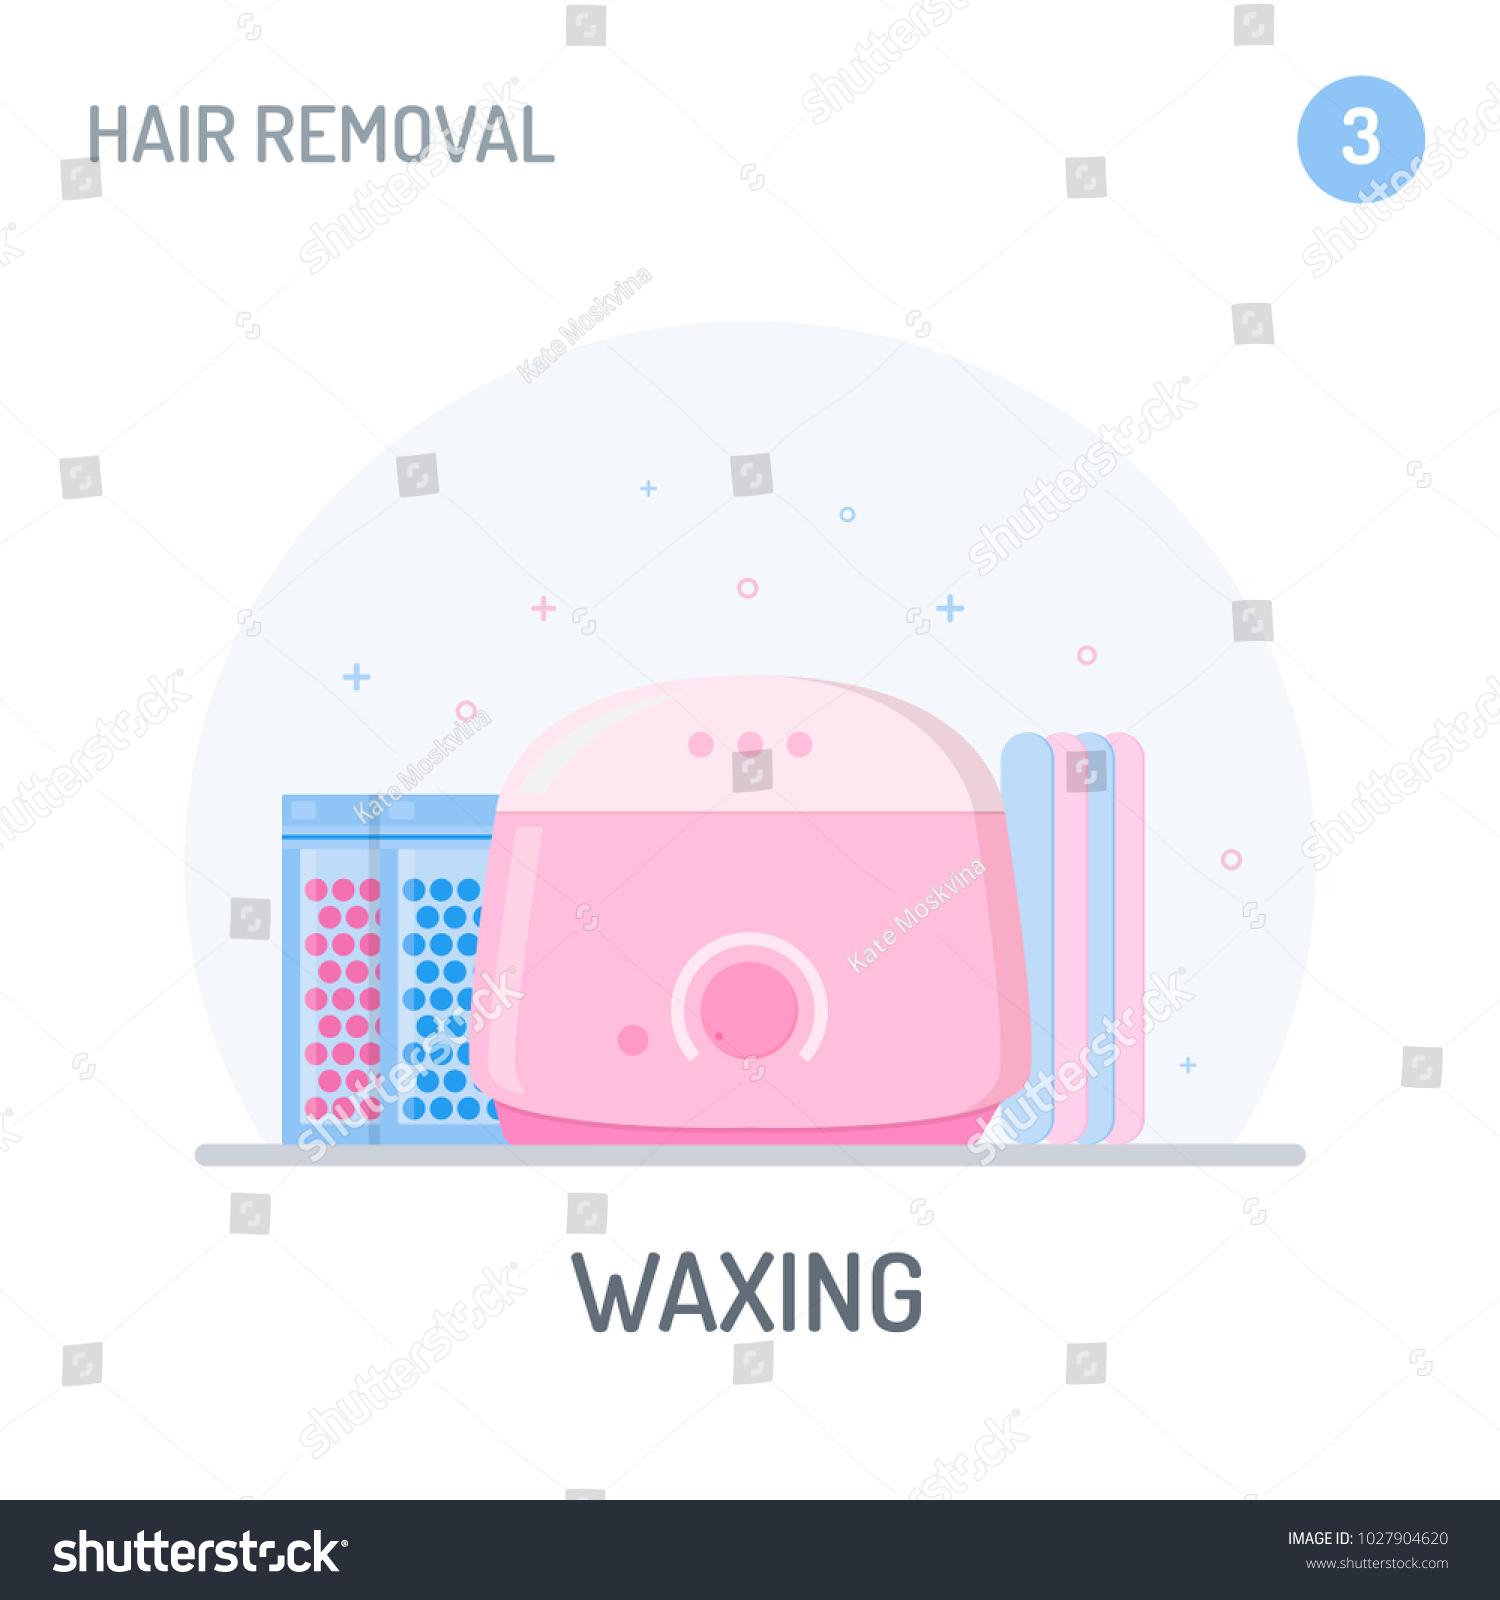 Hair Removal Waxing Hot Wax Warmer Stock Vector Royalty Free